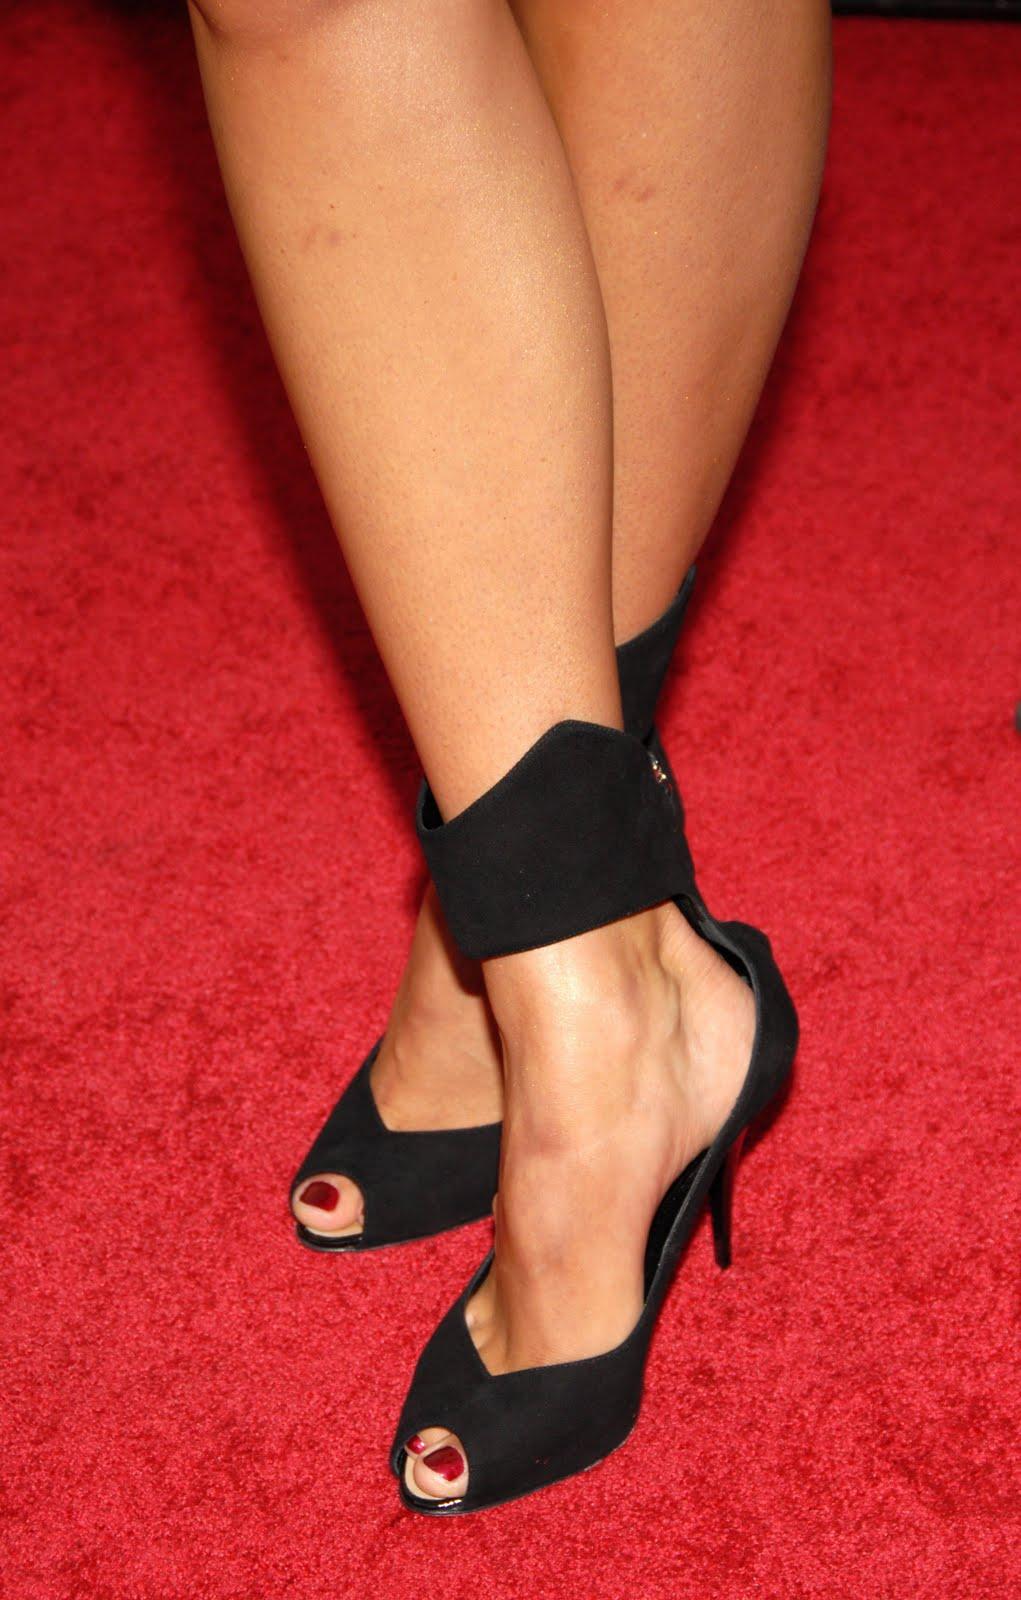 Total Celebrity Maria Sharapova Feet-1131